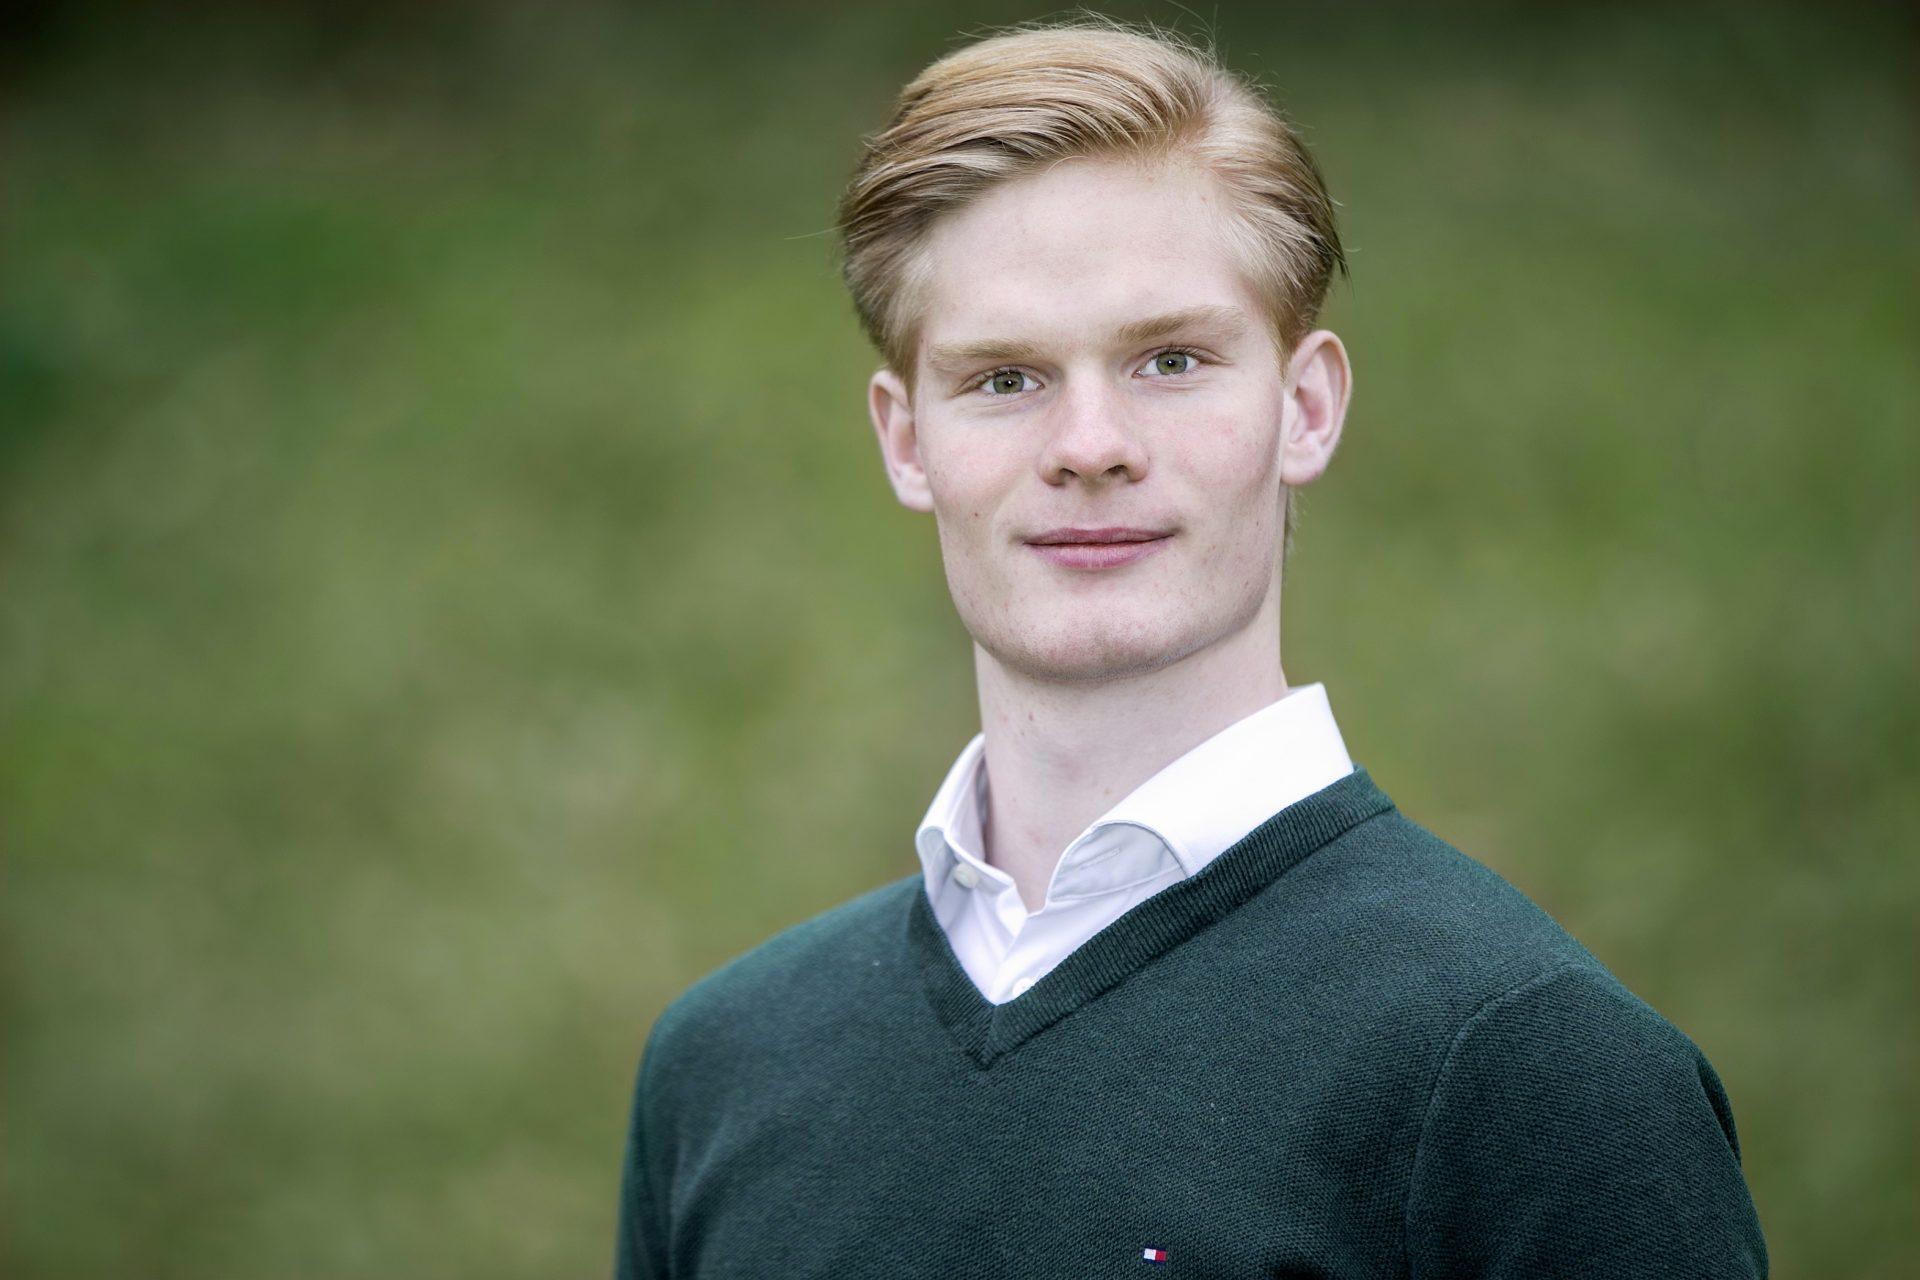 Venstre Horsens Frederik Allentoft-Andersen